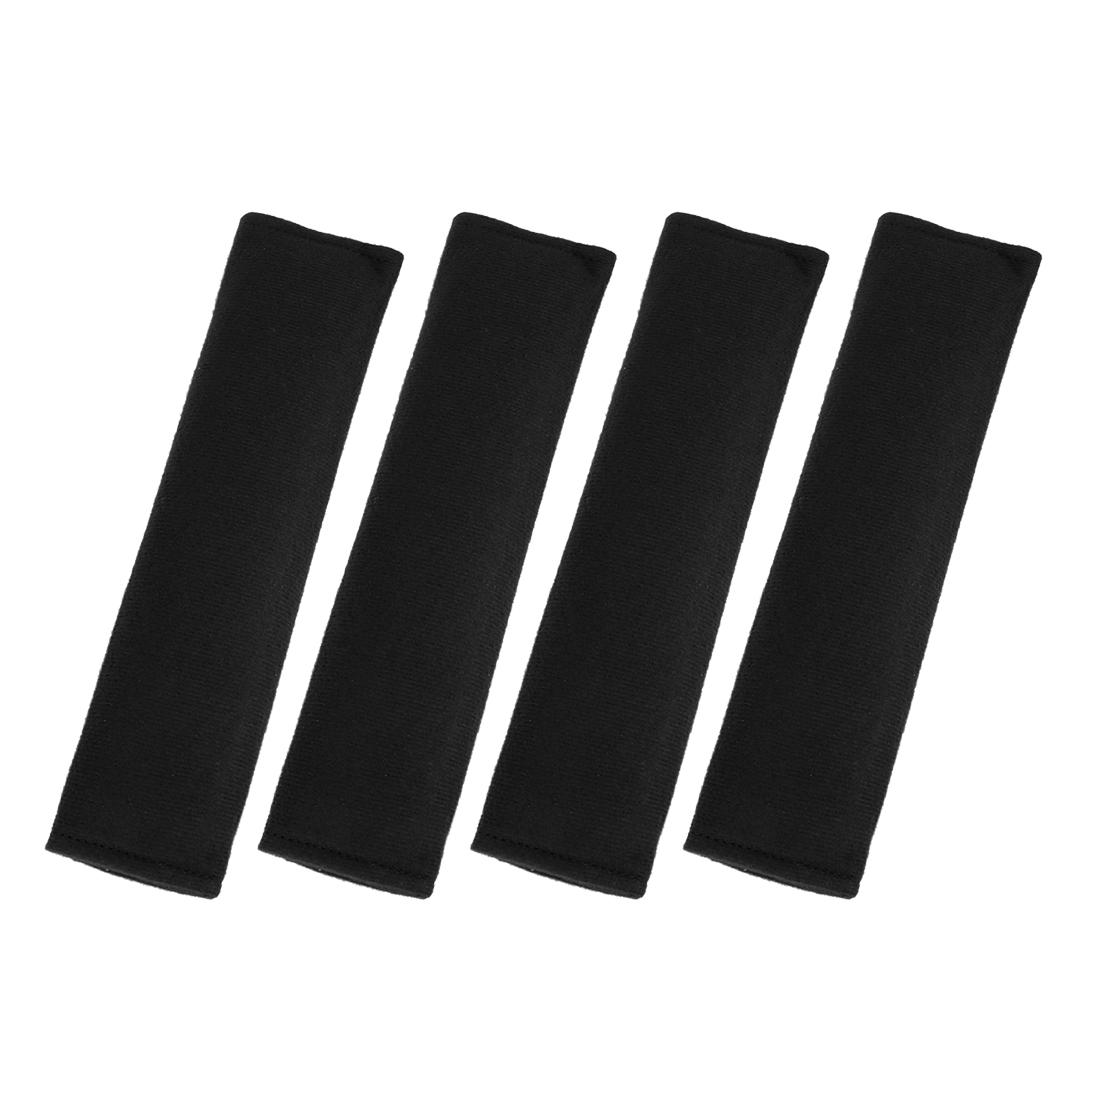 4pcs Universal Black Seat Belt Cover Shoulder Pad Strap Protector for Car Truck